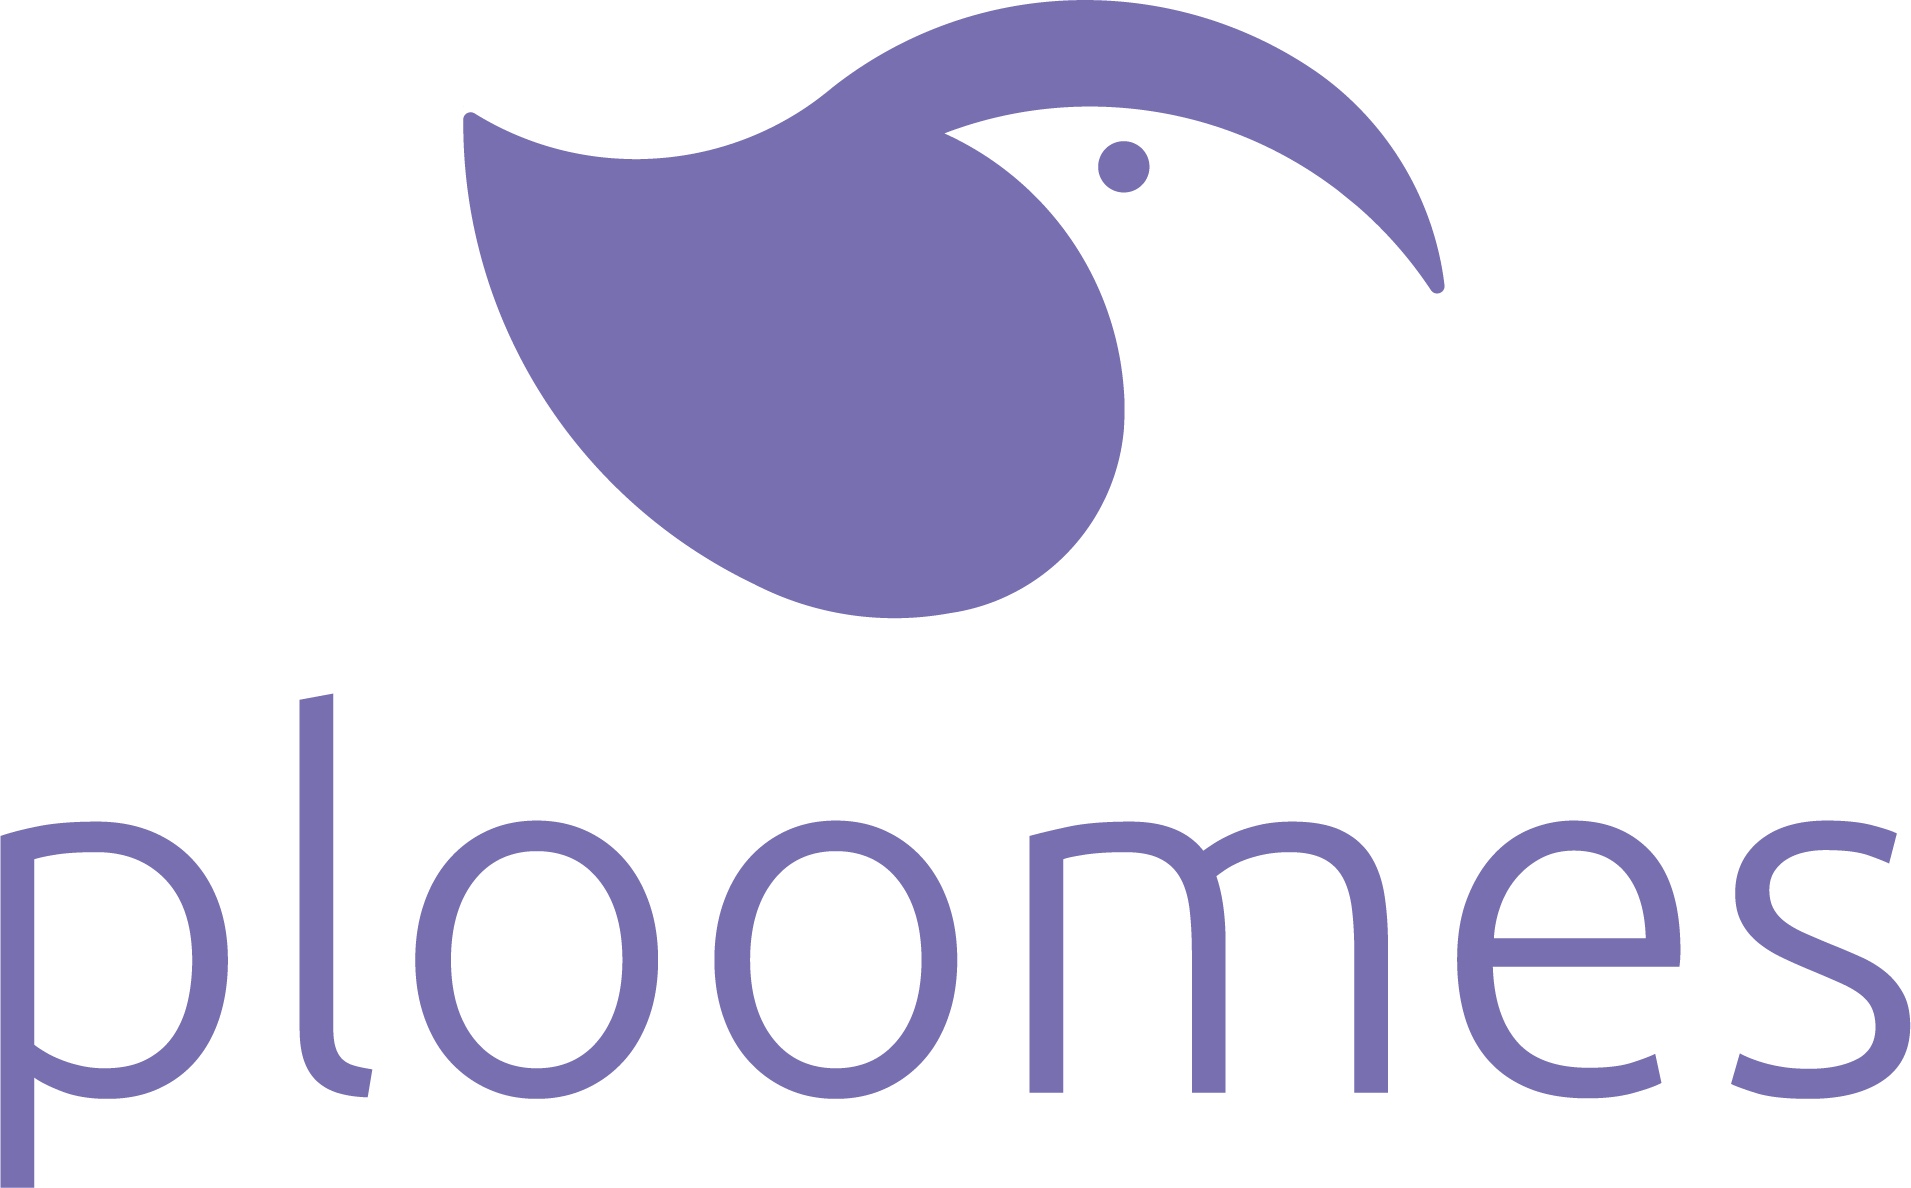 Ploomes CRM